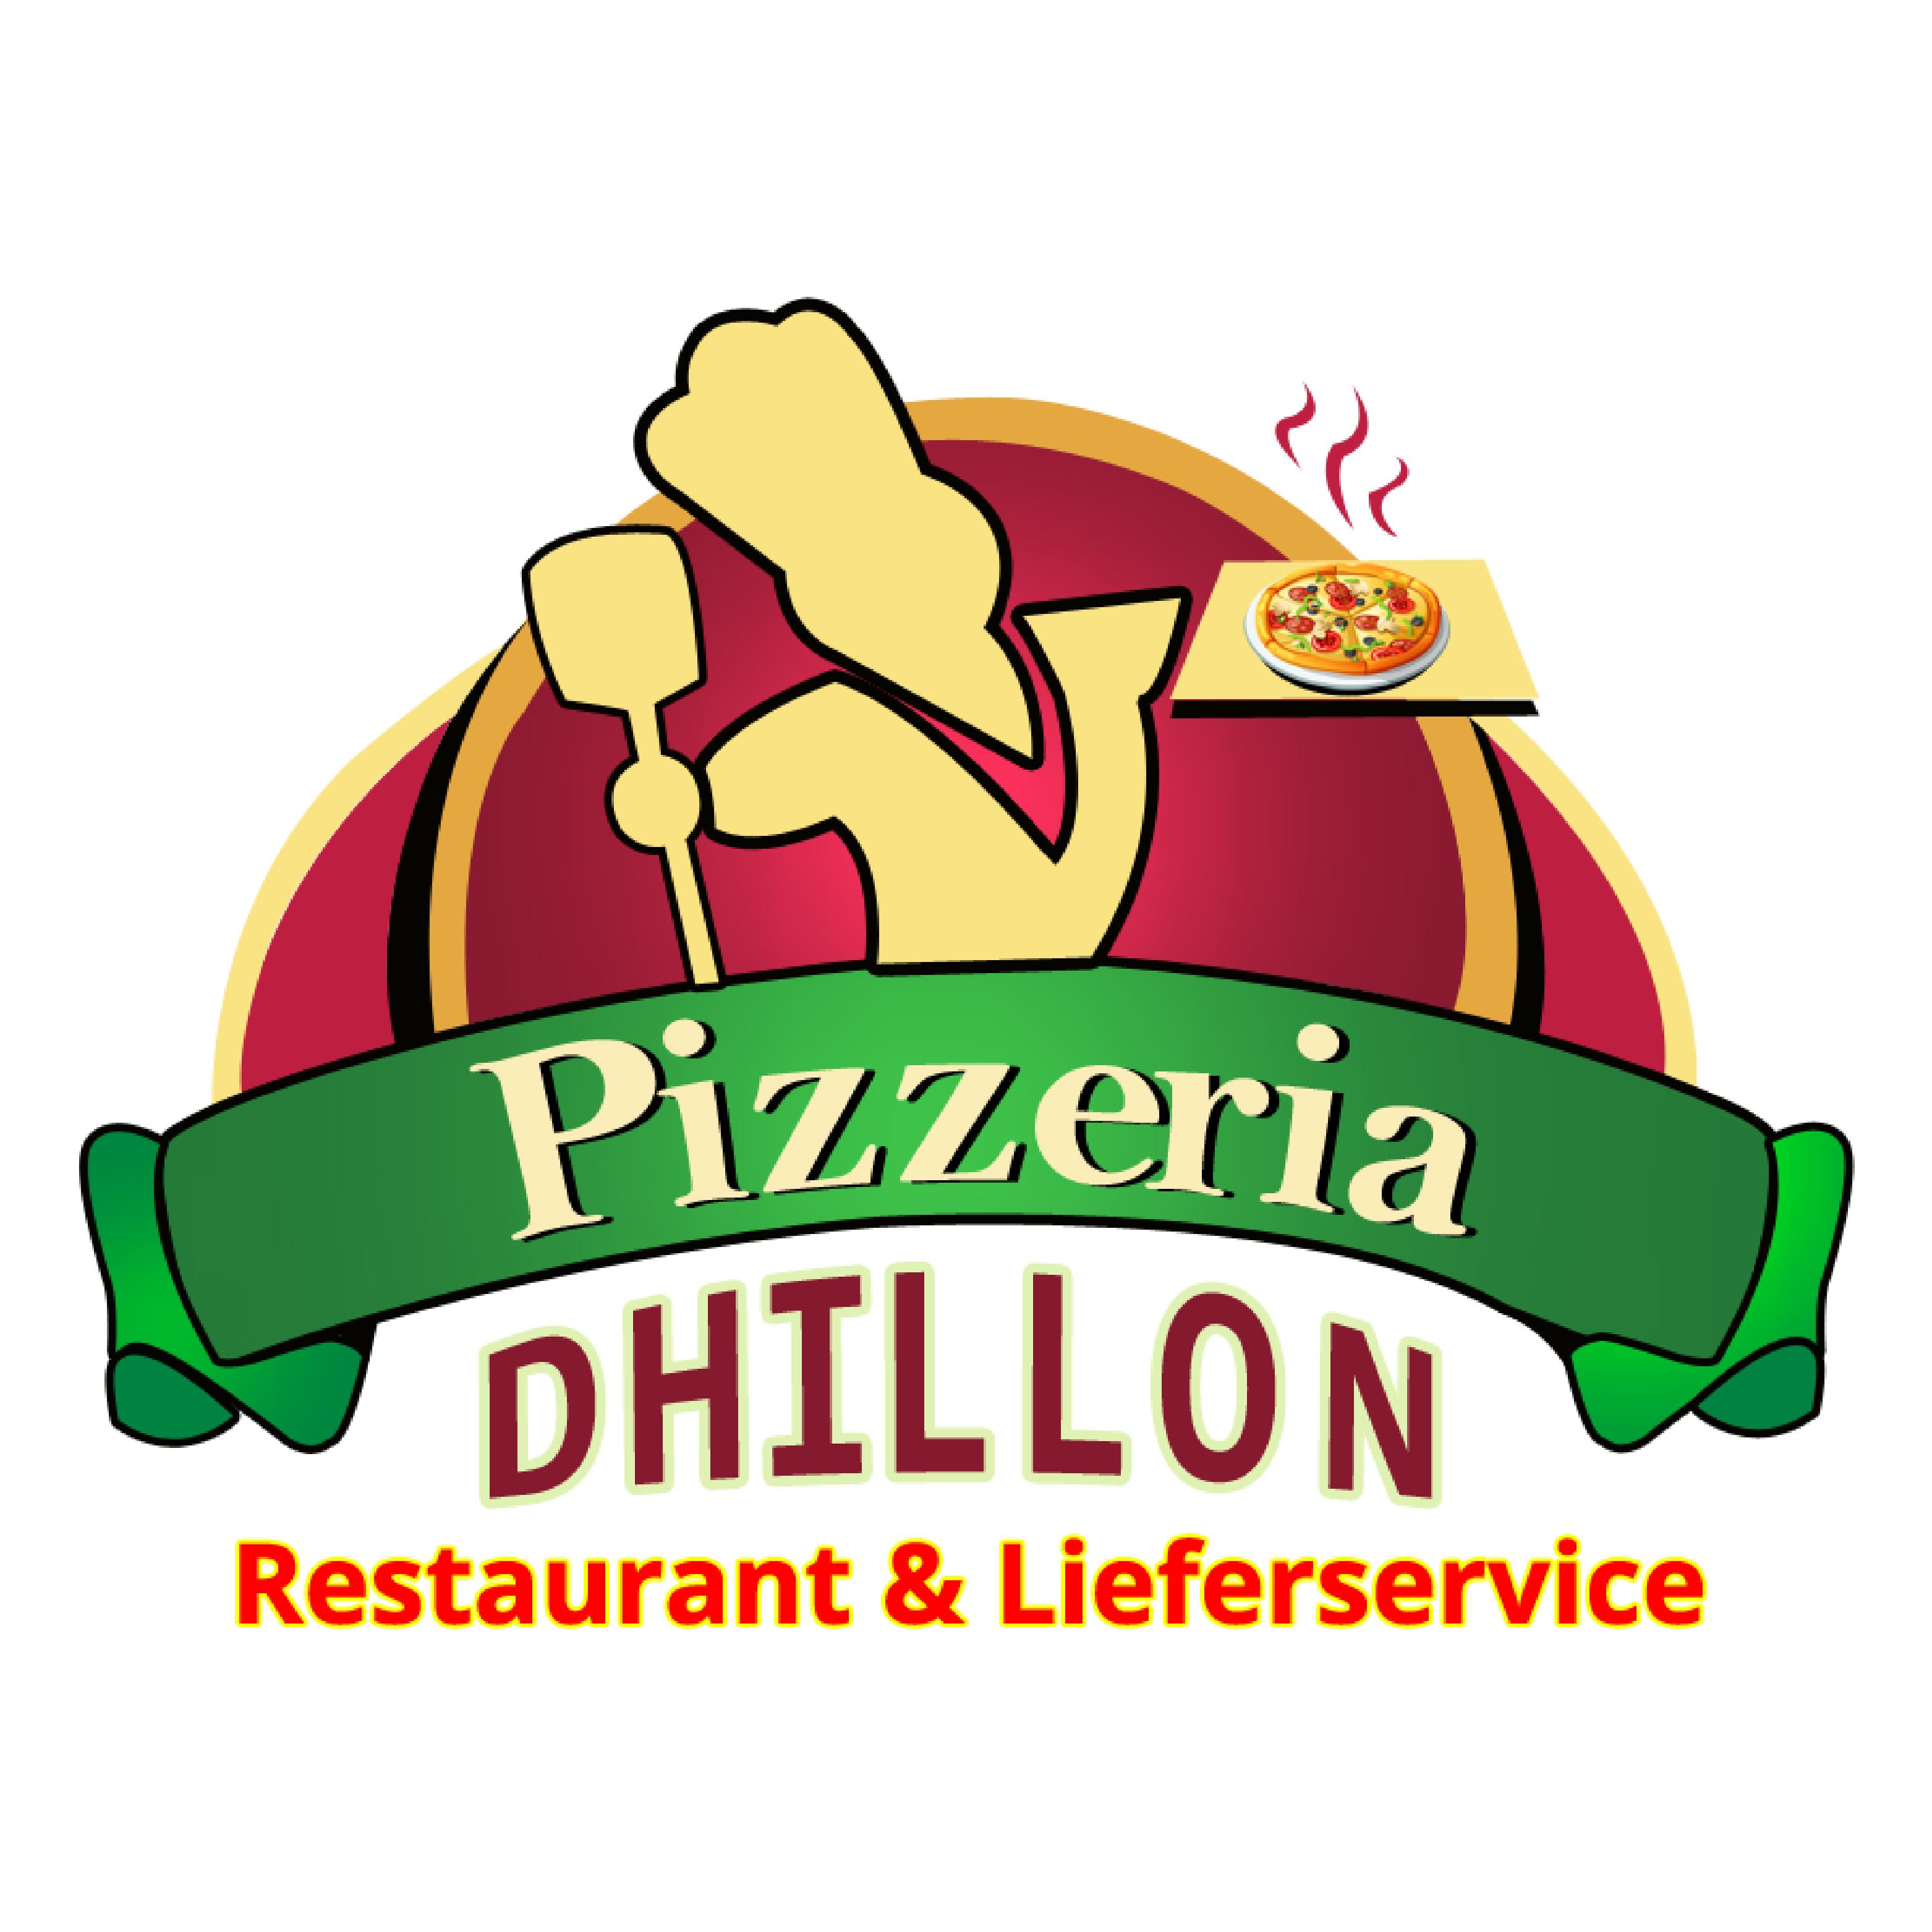 Pizzeria Dhillon Restaurant & Lieferservice